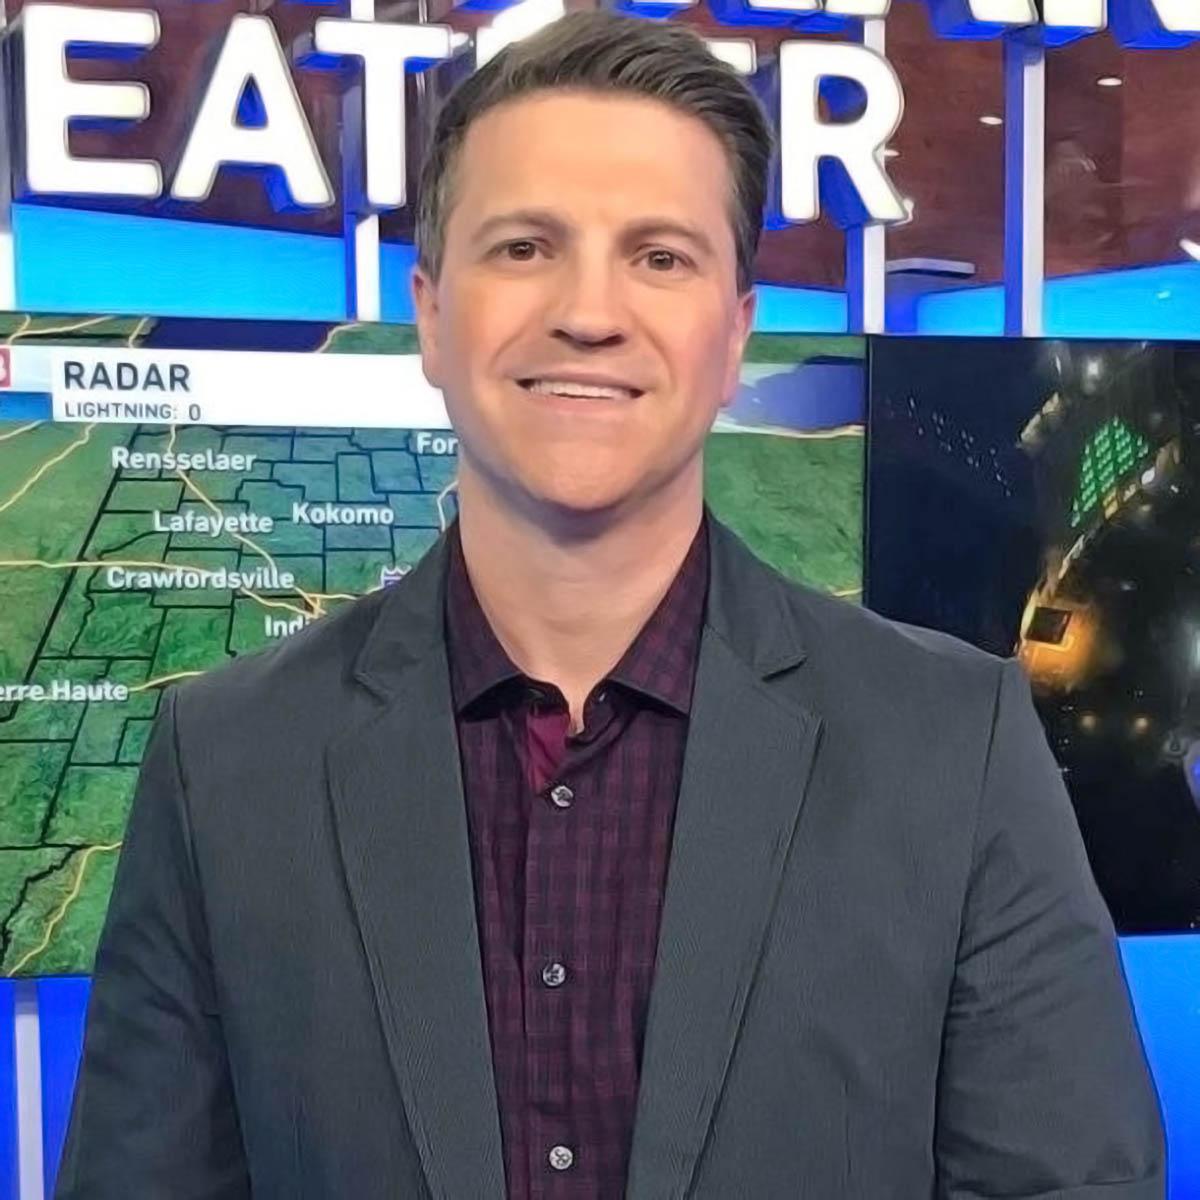 Sean Ash works for WTHR News